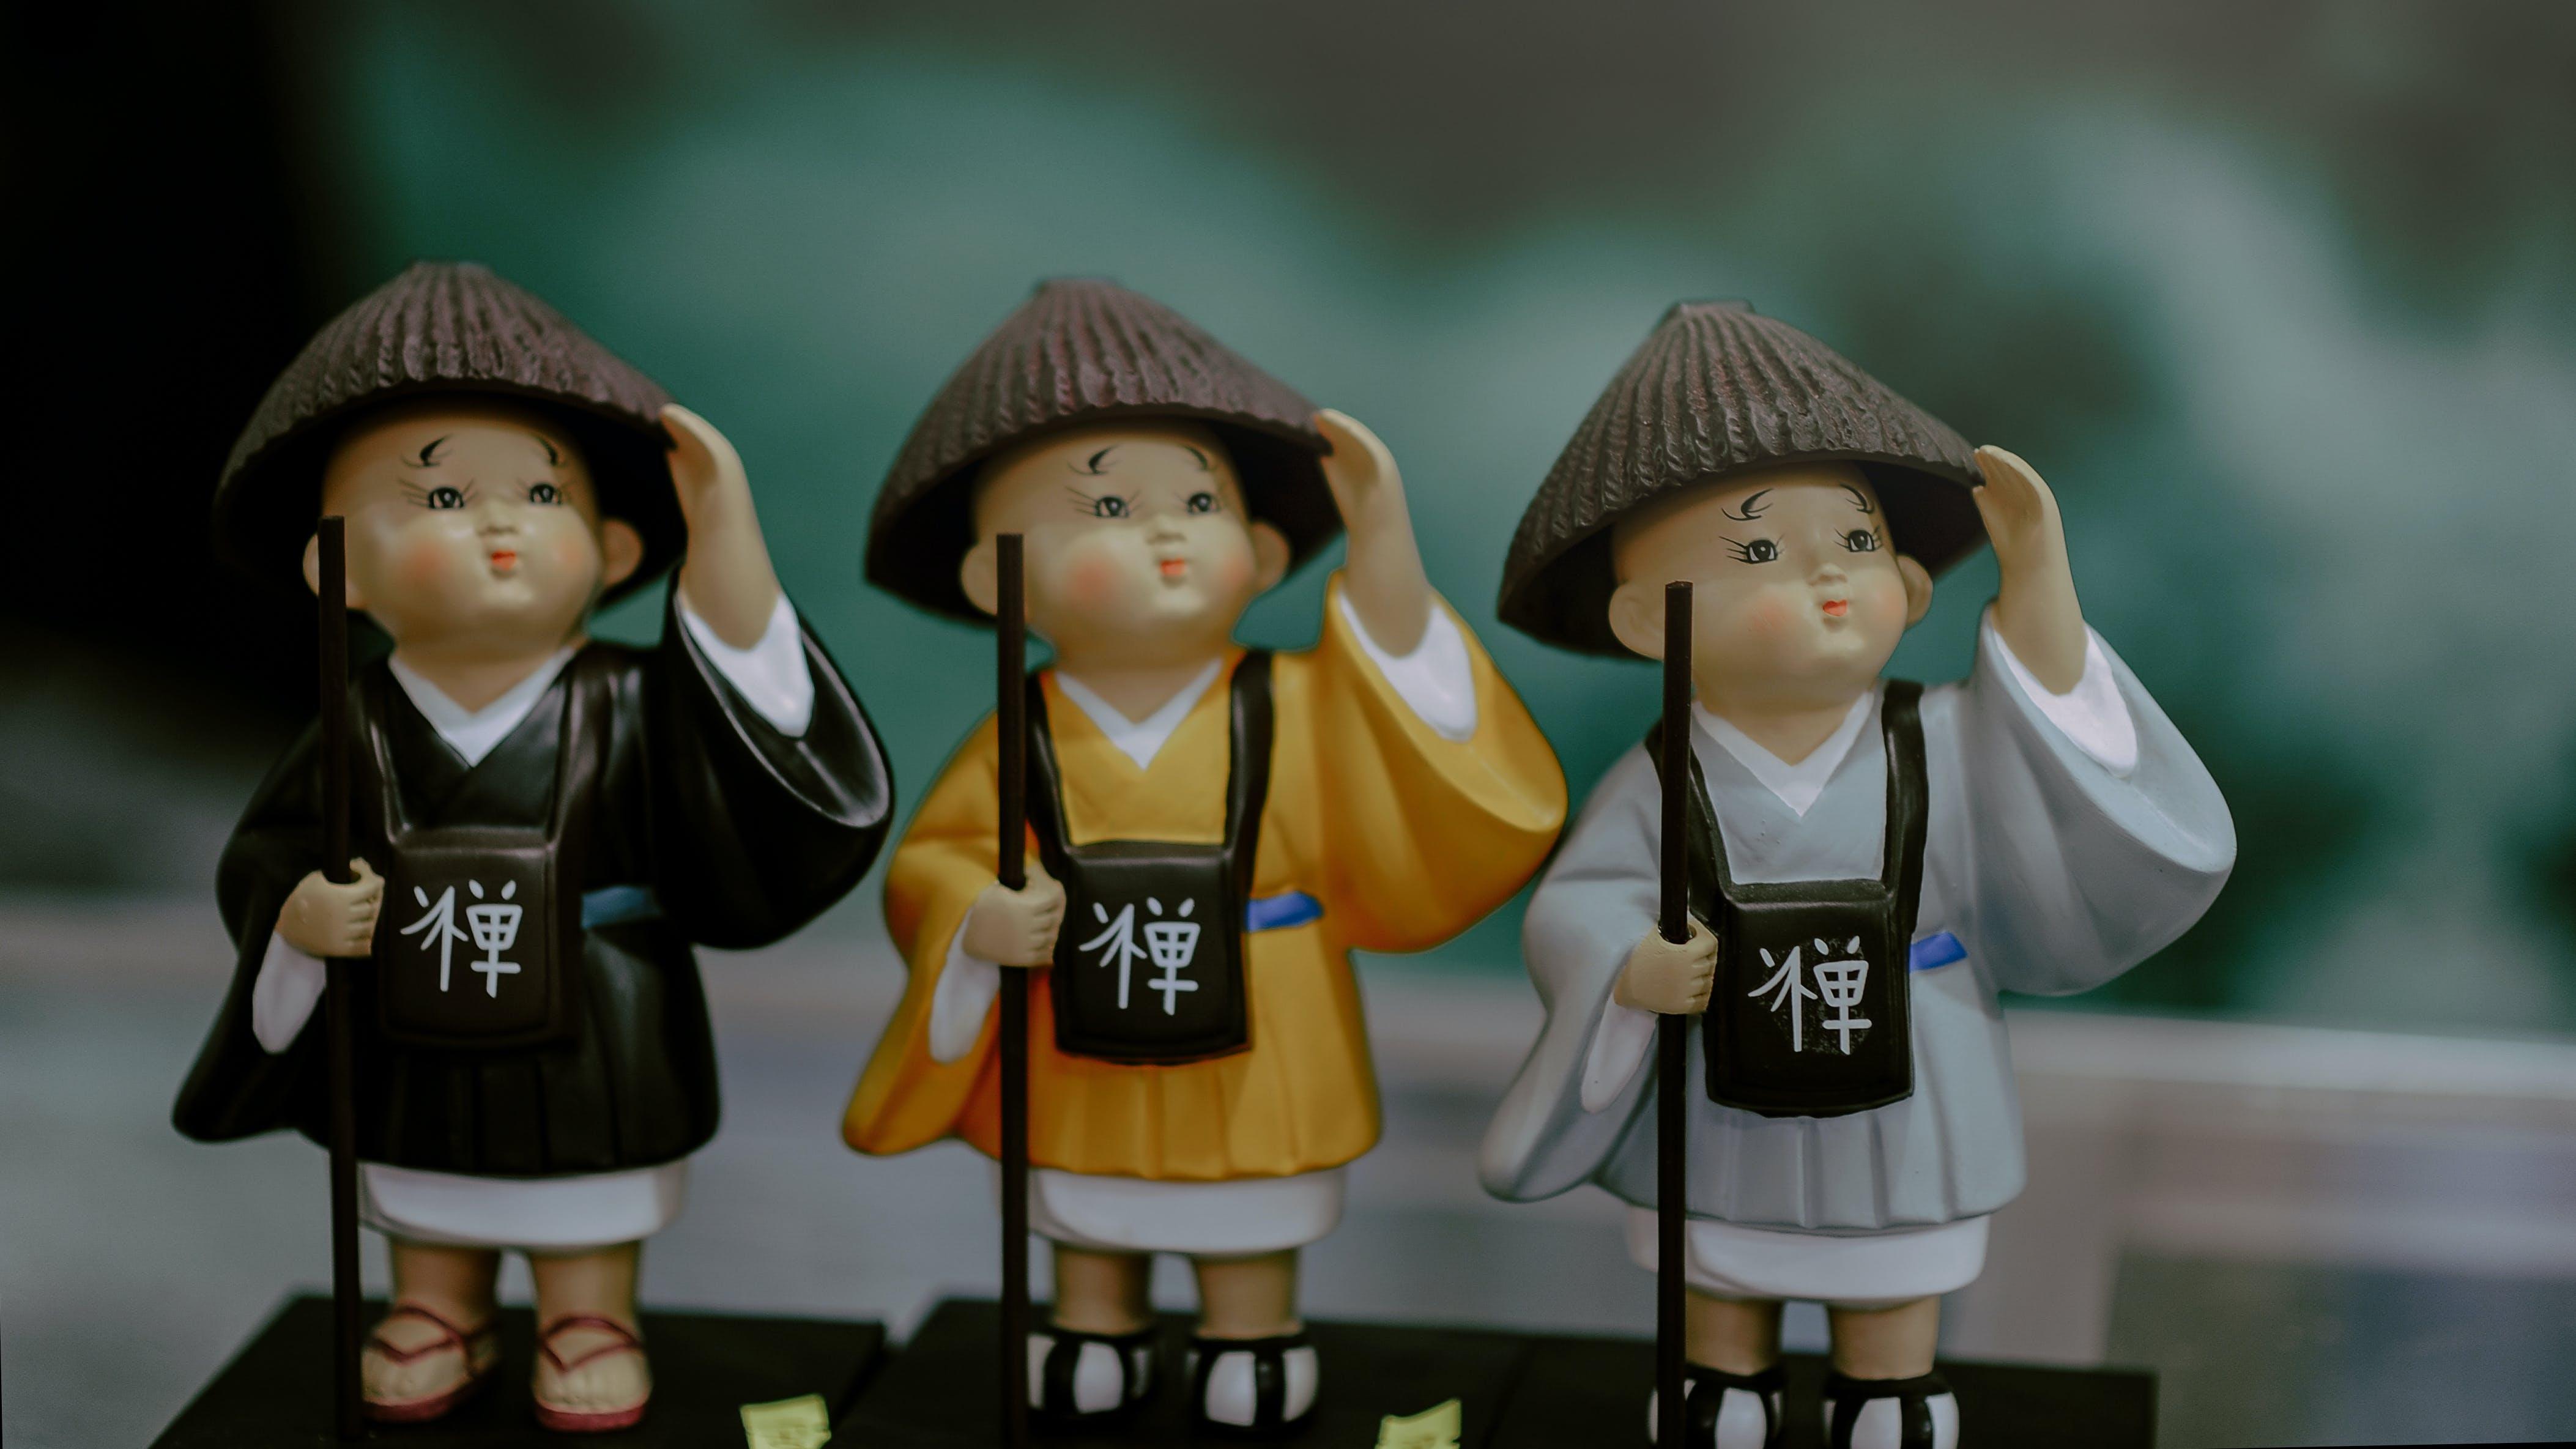 Three Monks Wearing Brown Hat Looking Up Figurines Set